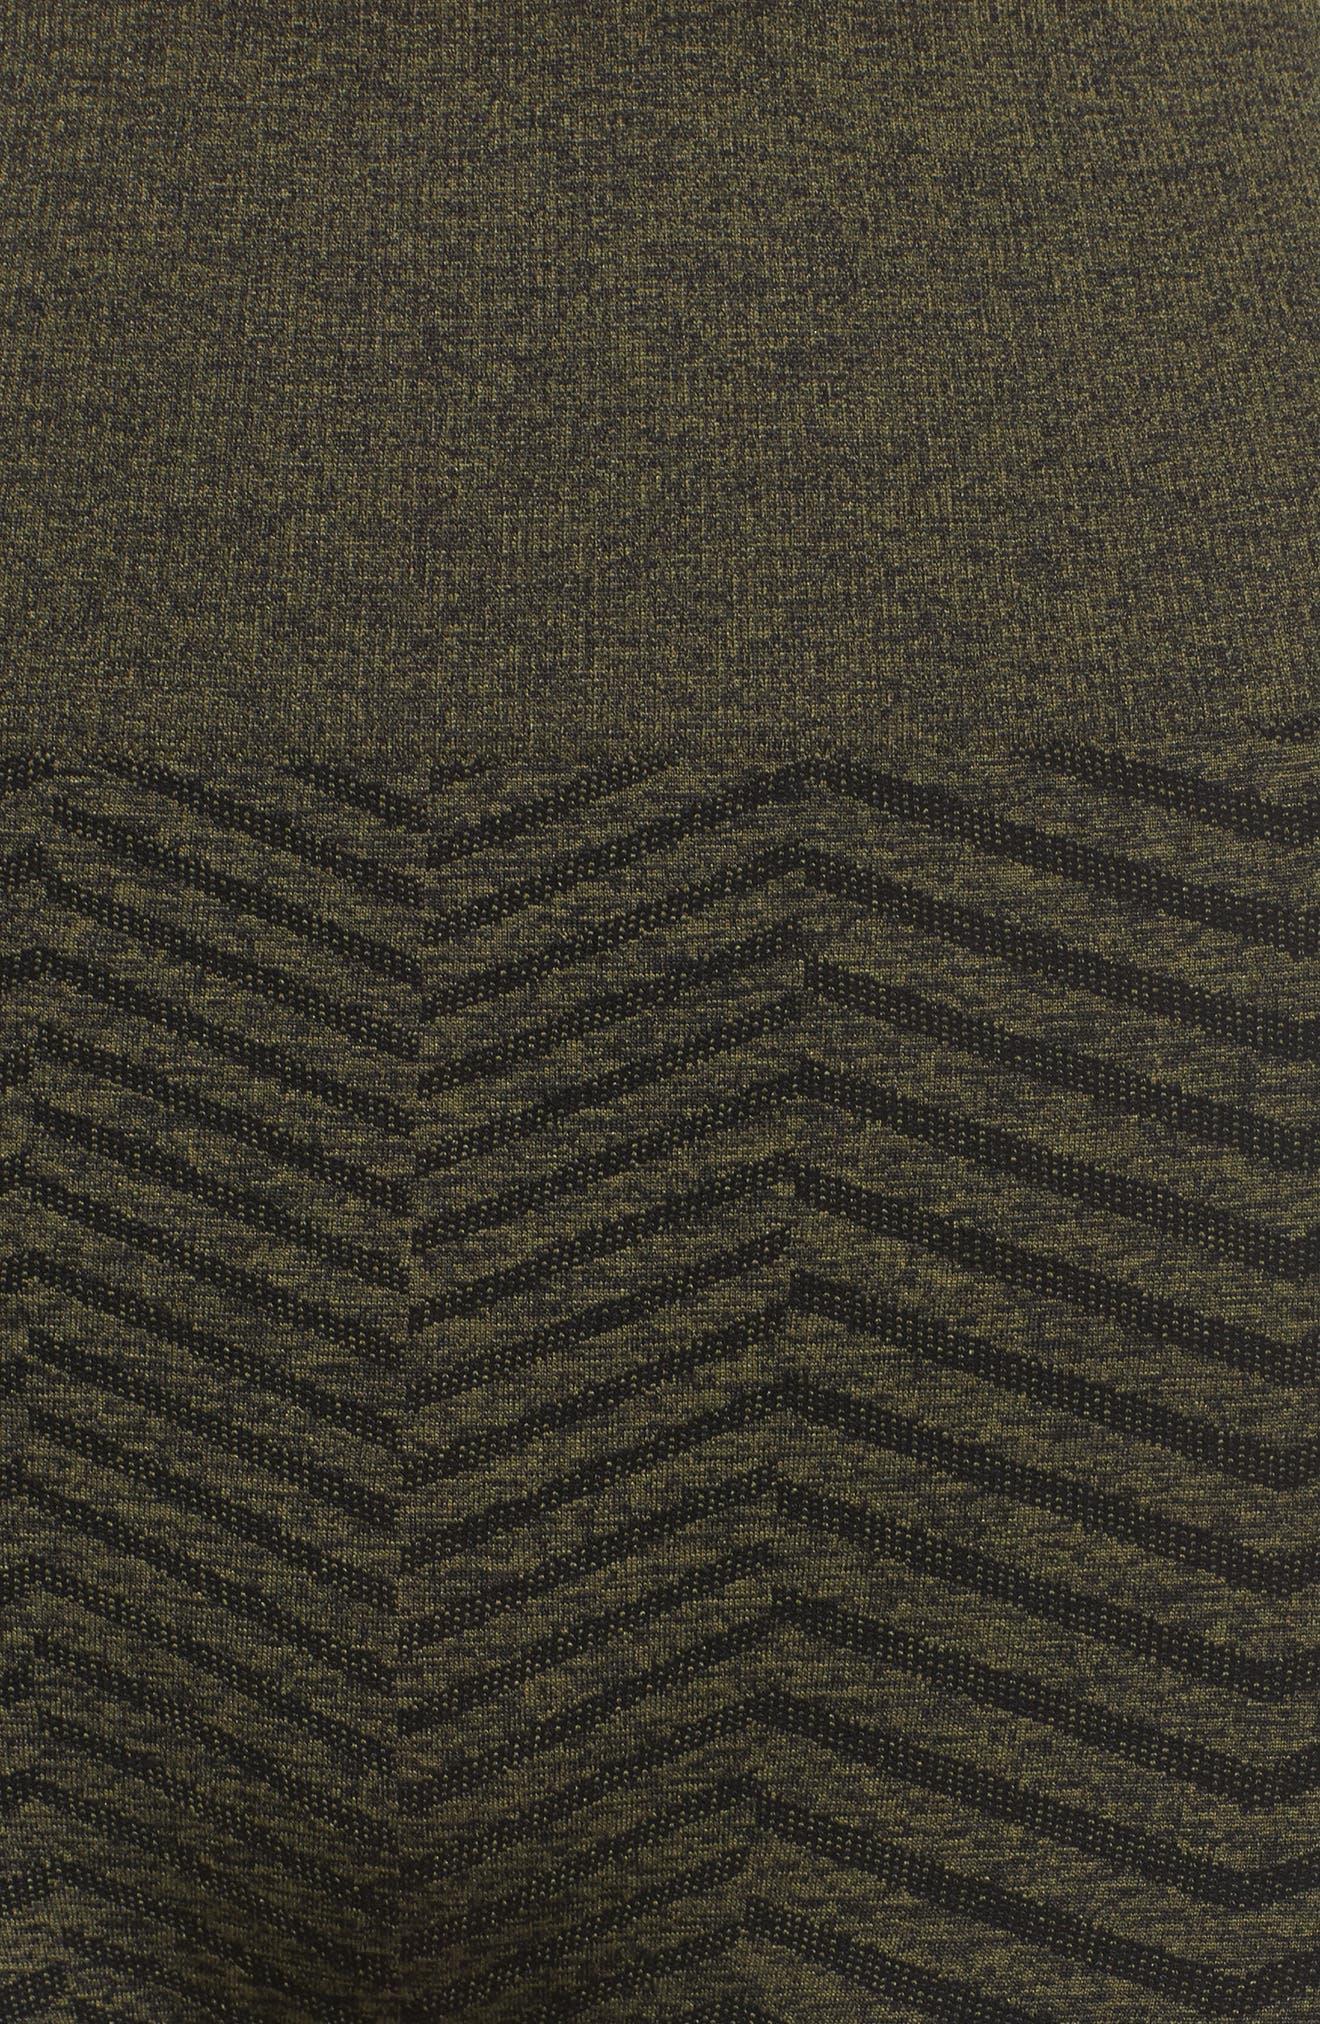 Cadence High Waist Leggings,                             Alternate thumbnail 6, color,                             Deep Lichen Green/ Black